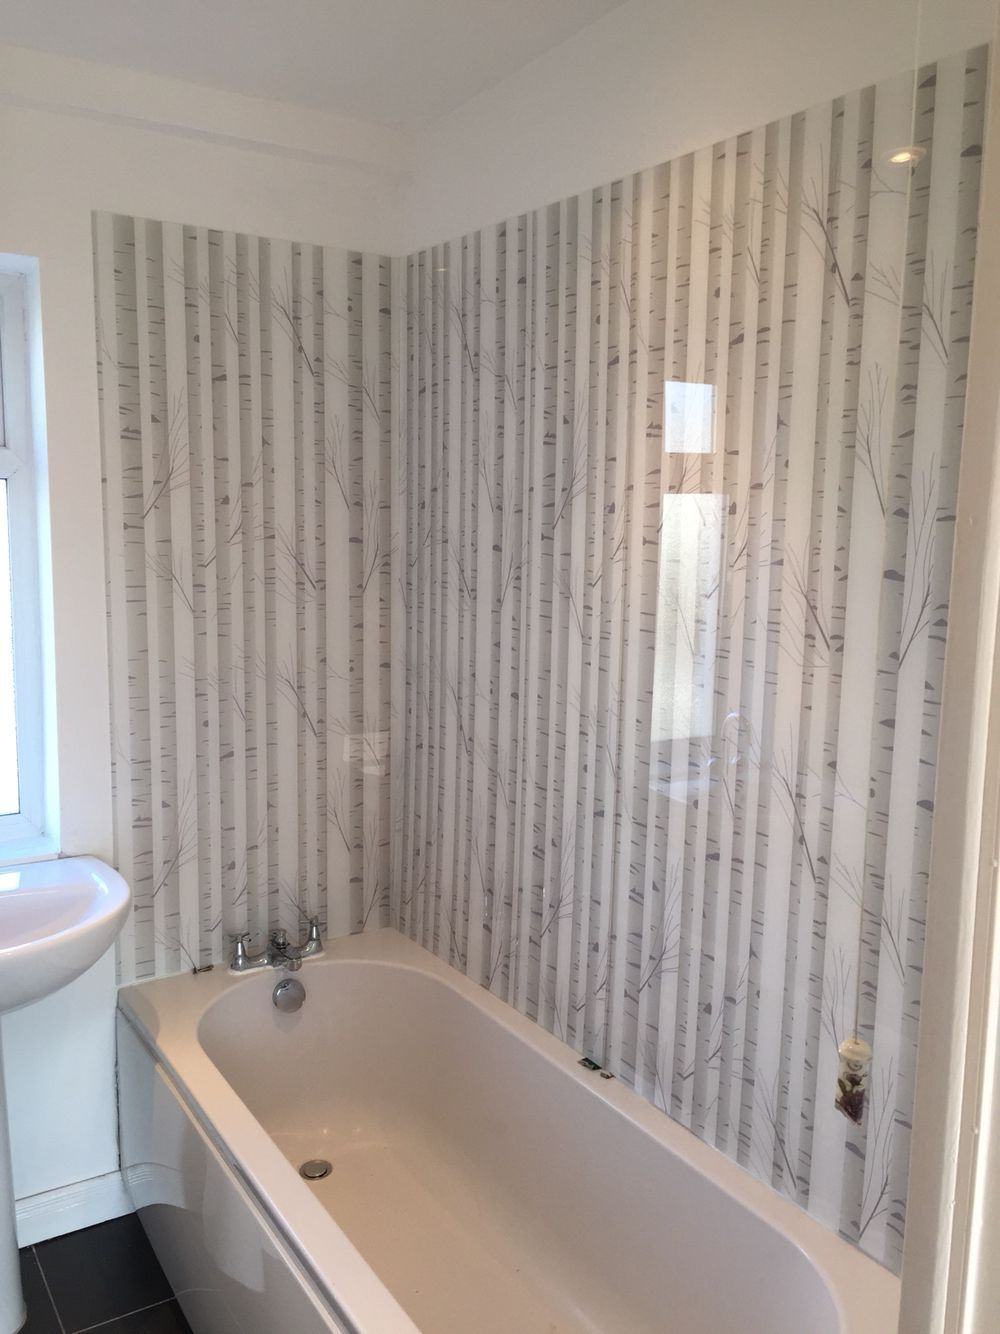 Acrylic shower u bath panels in uwoodland silhouetteu design by